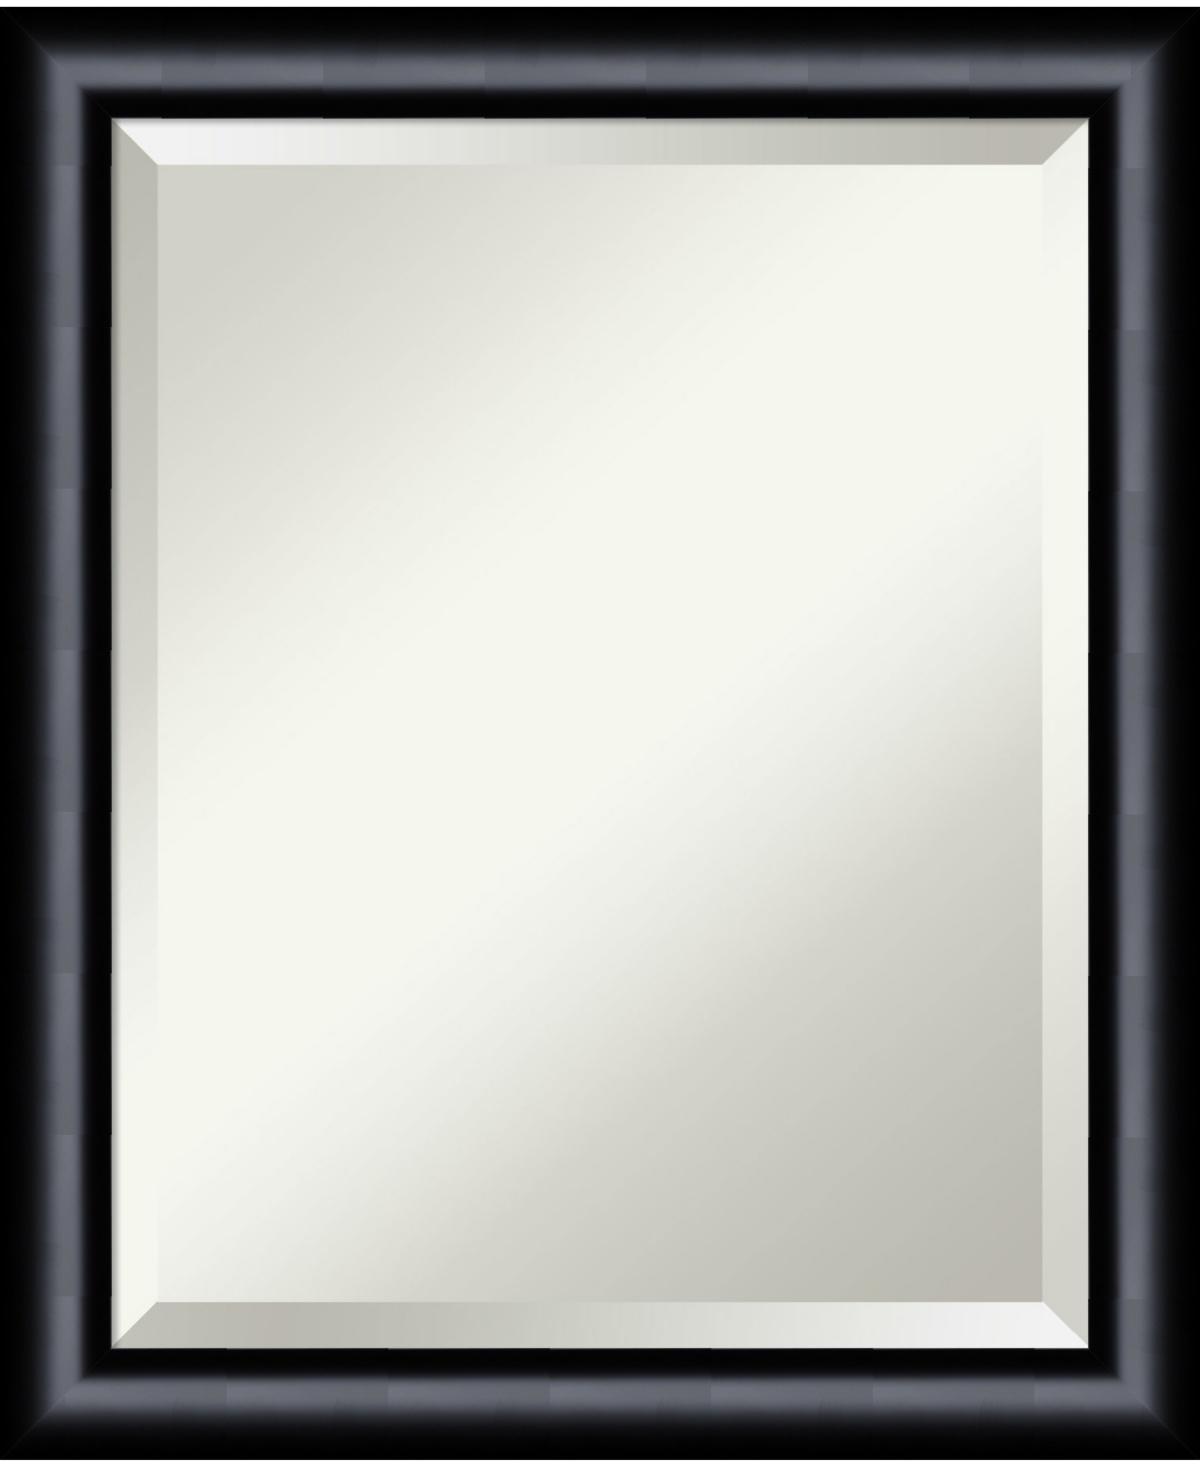 Amanti Art Steinway Scoop 19x23 Bathroom Mirror